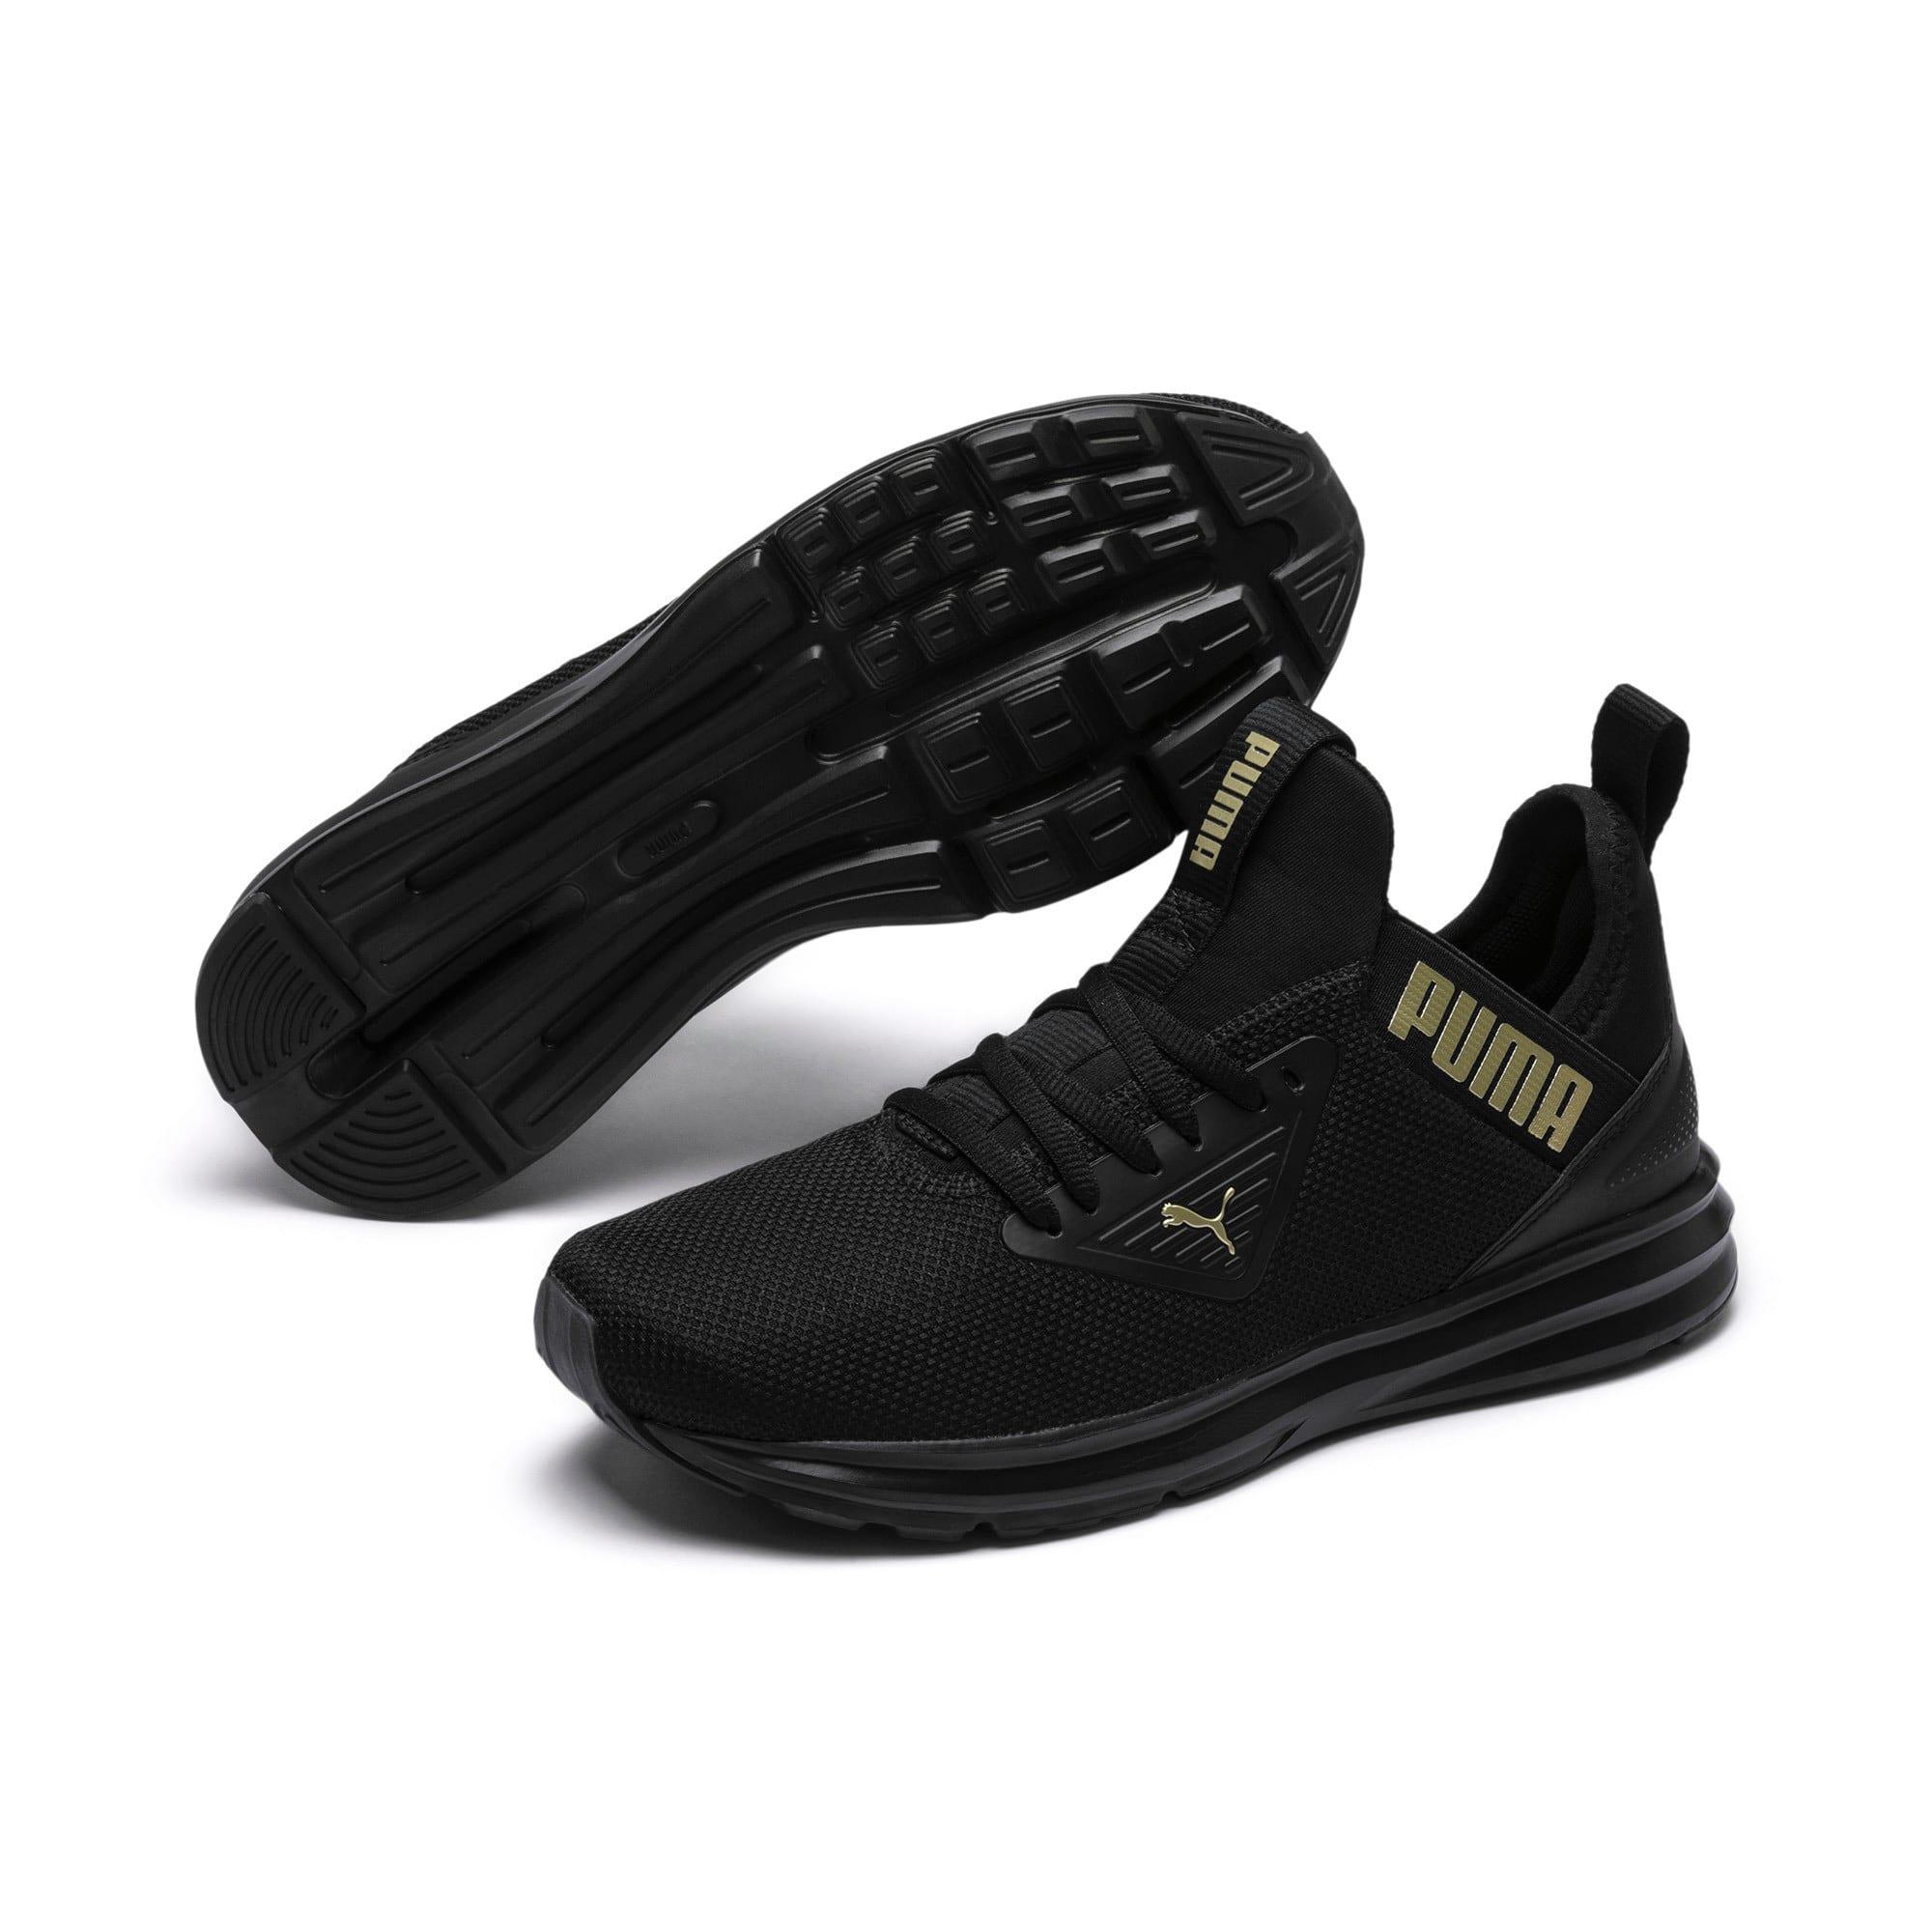 Thumbnail 2 of Enzo Beta Women's Training Shoes, Puma Black-Metallic Gold, medium